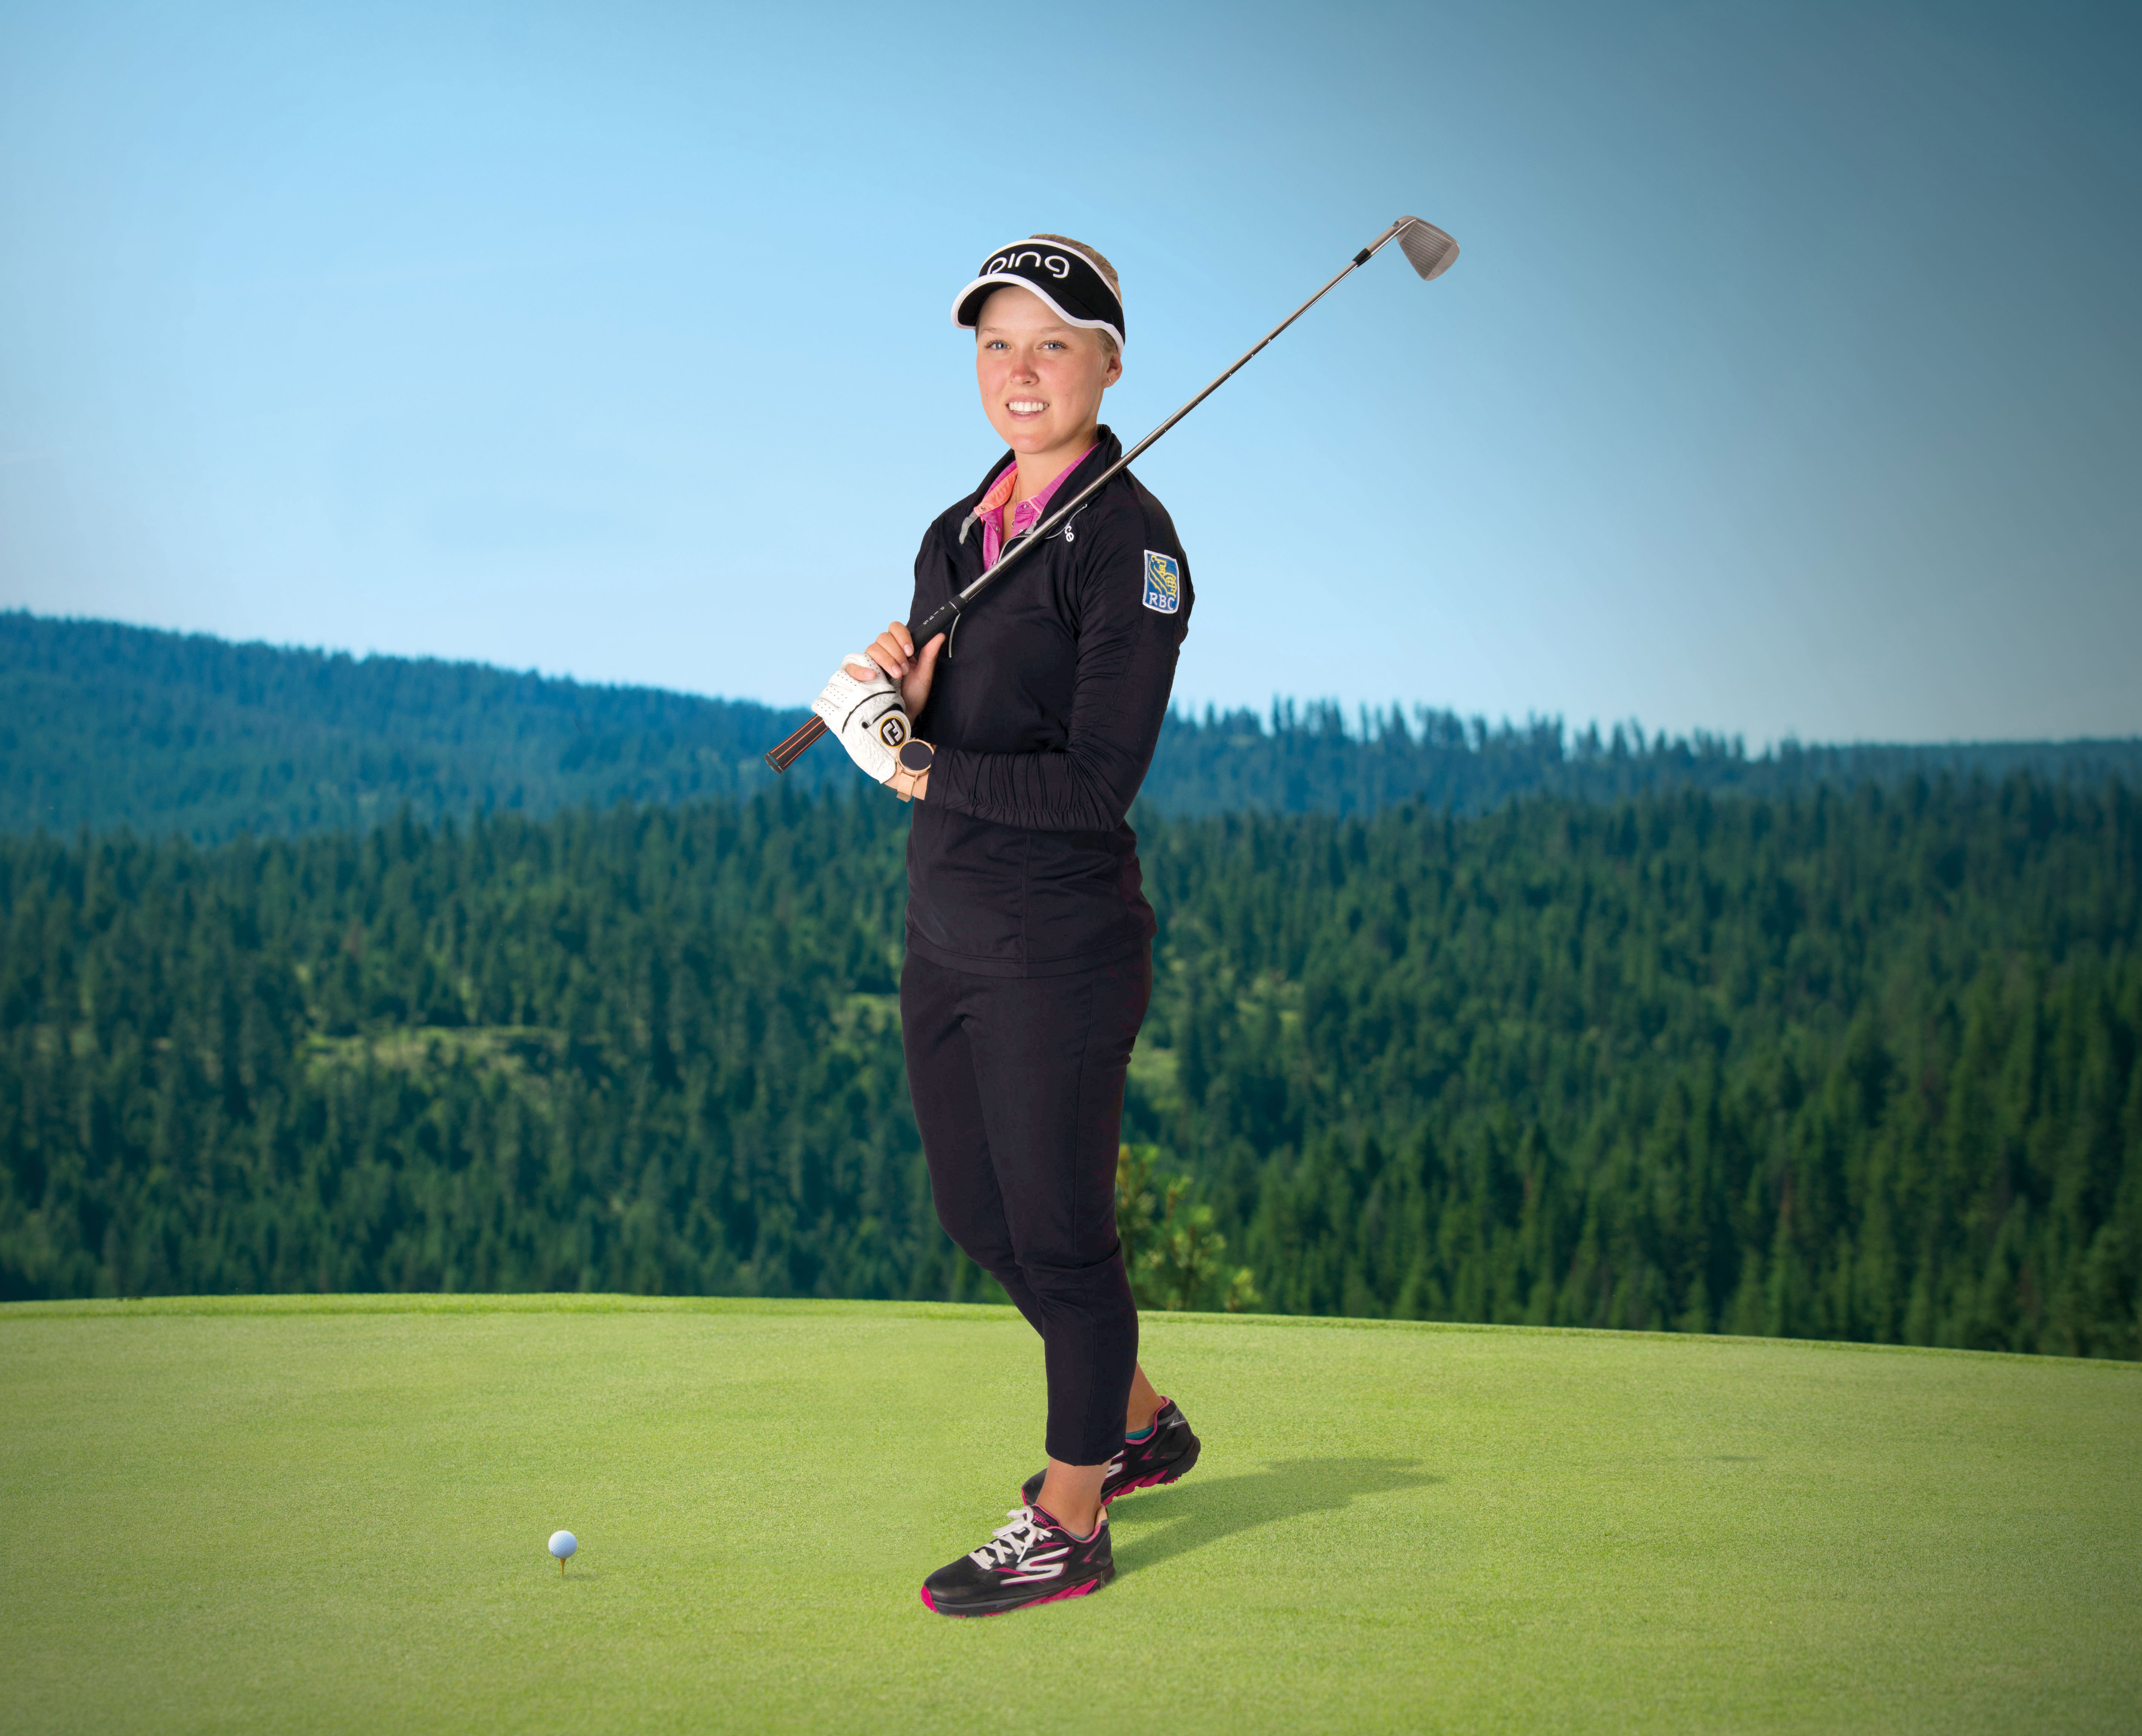 sketchers for women golf